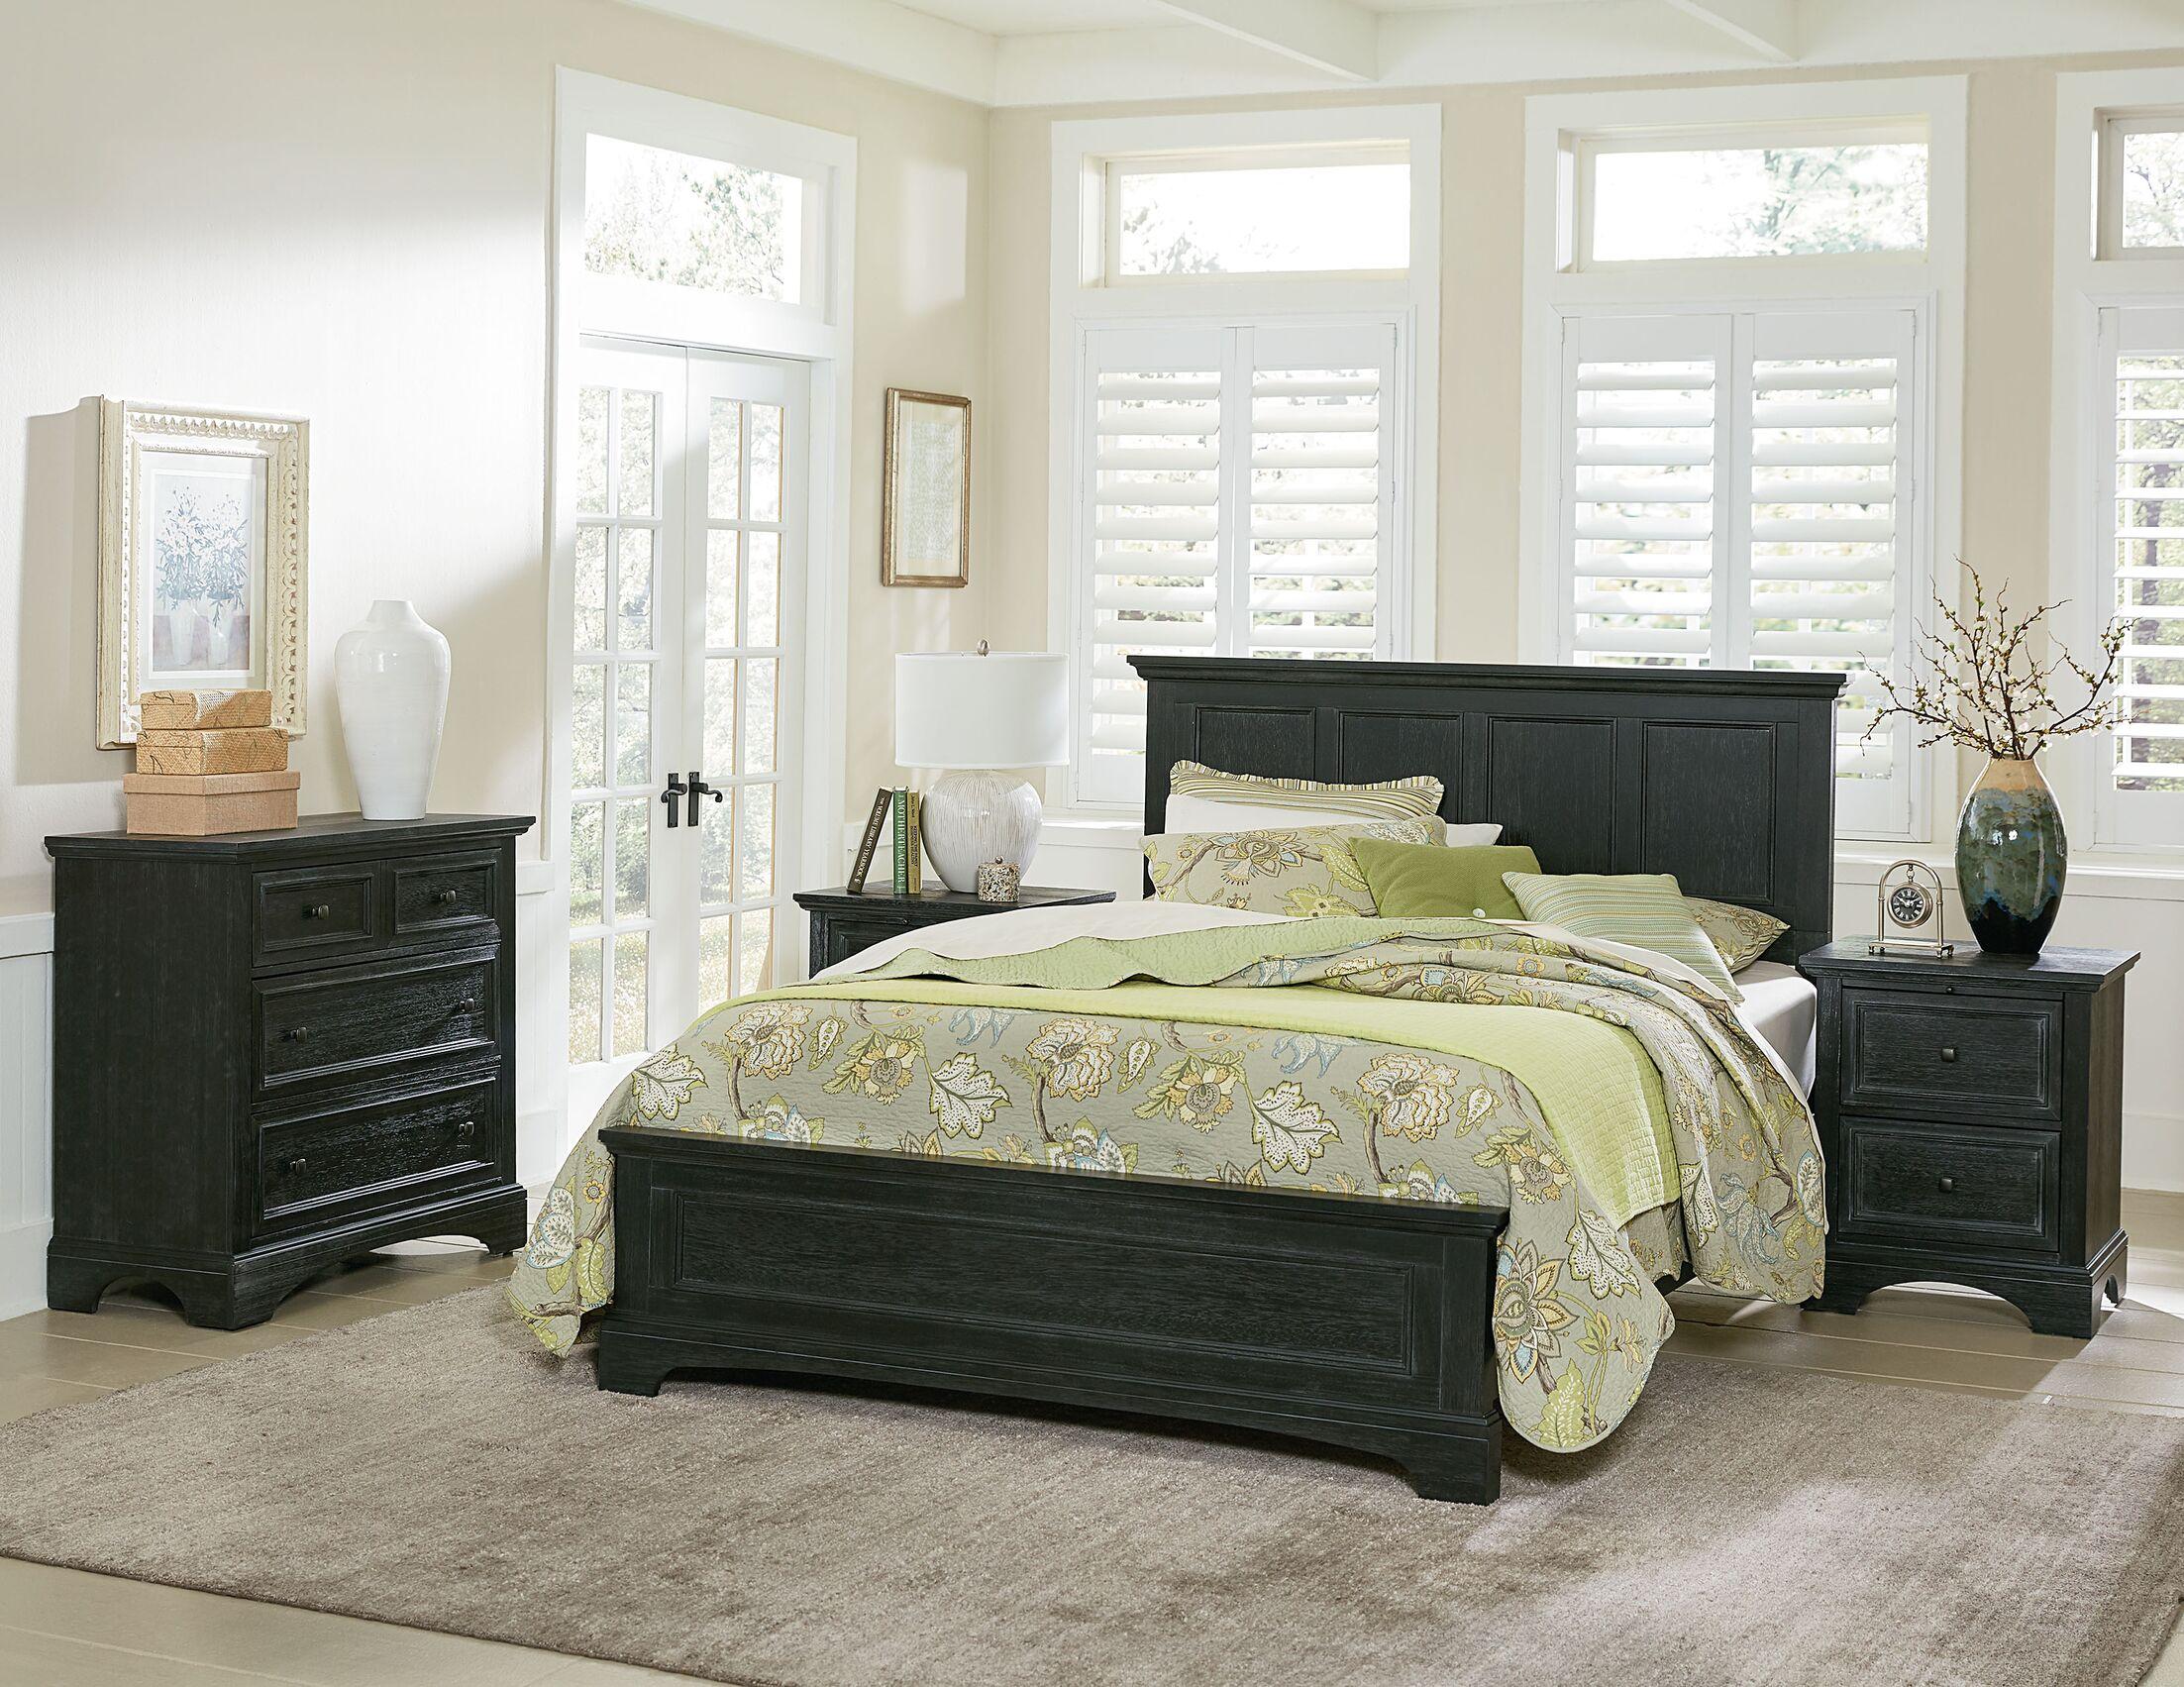 Cintron Panel 4 Piece Bedroom Set Size: King